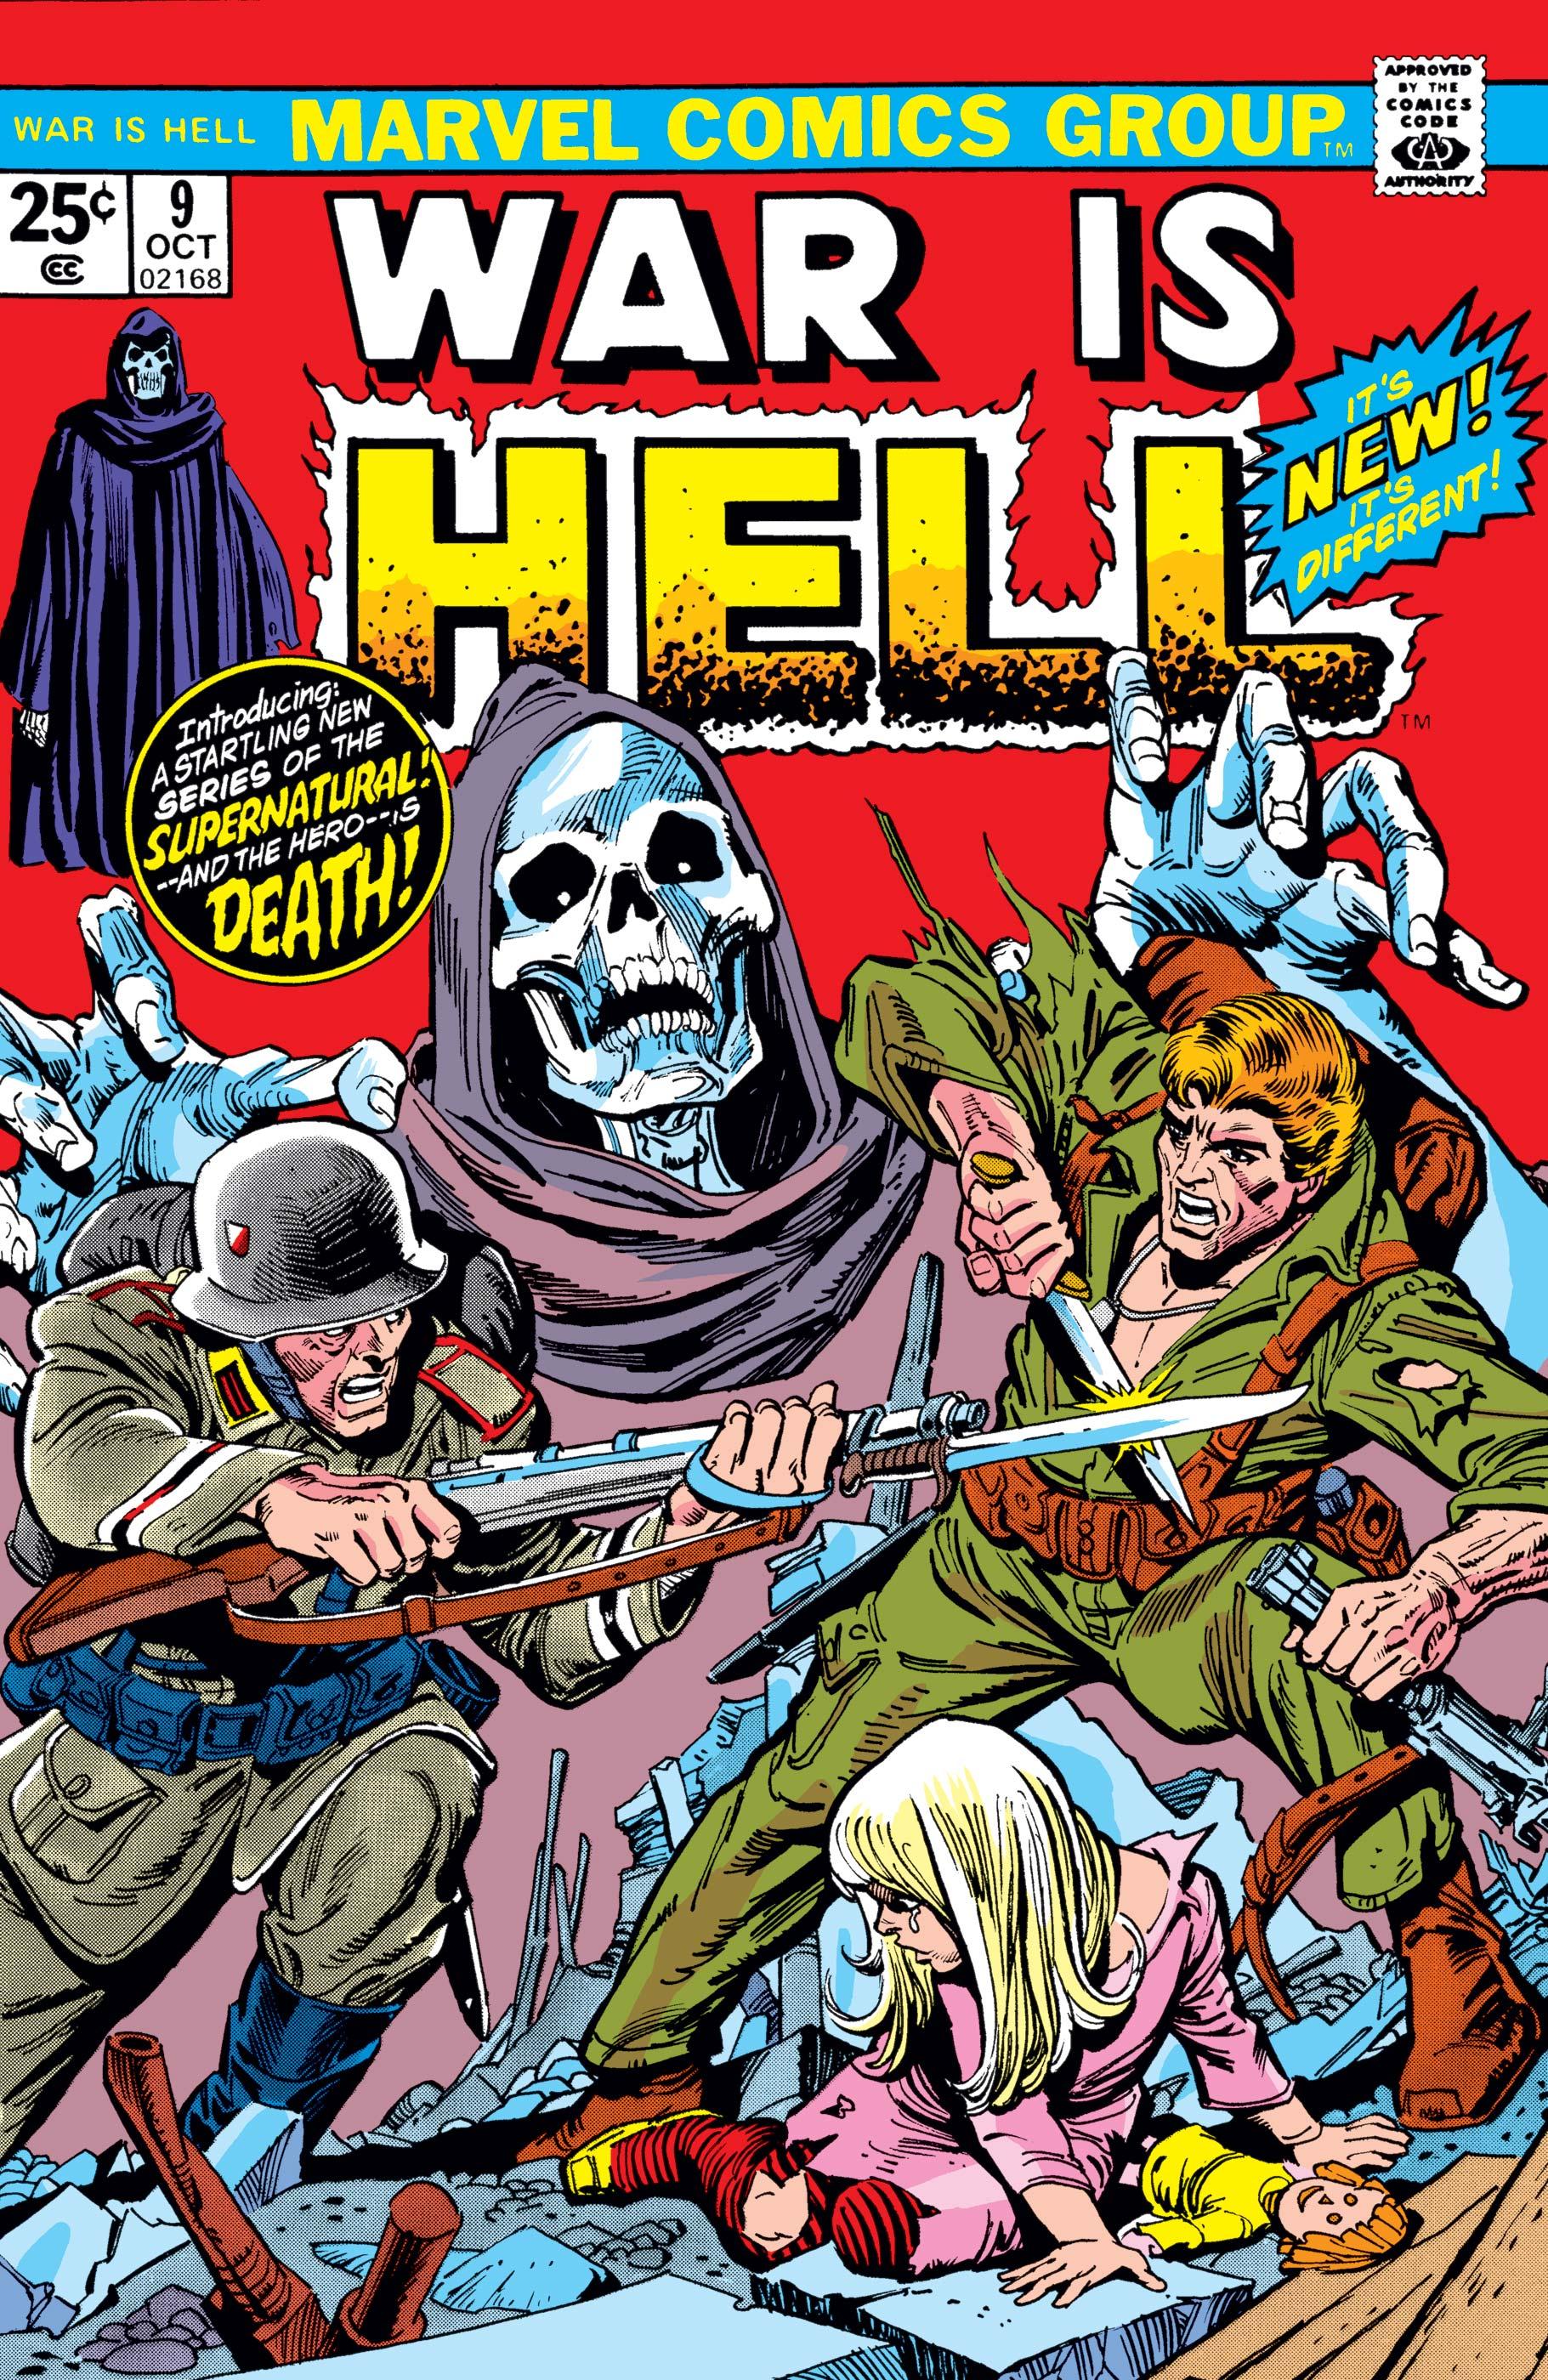 War Is Hell (1973) #9